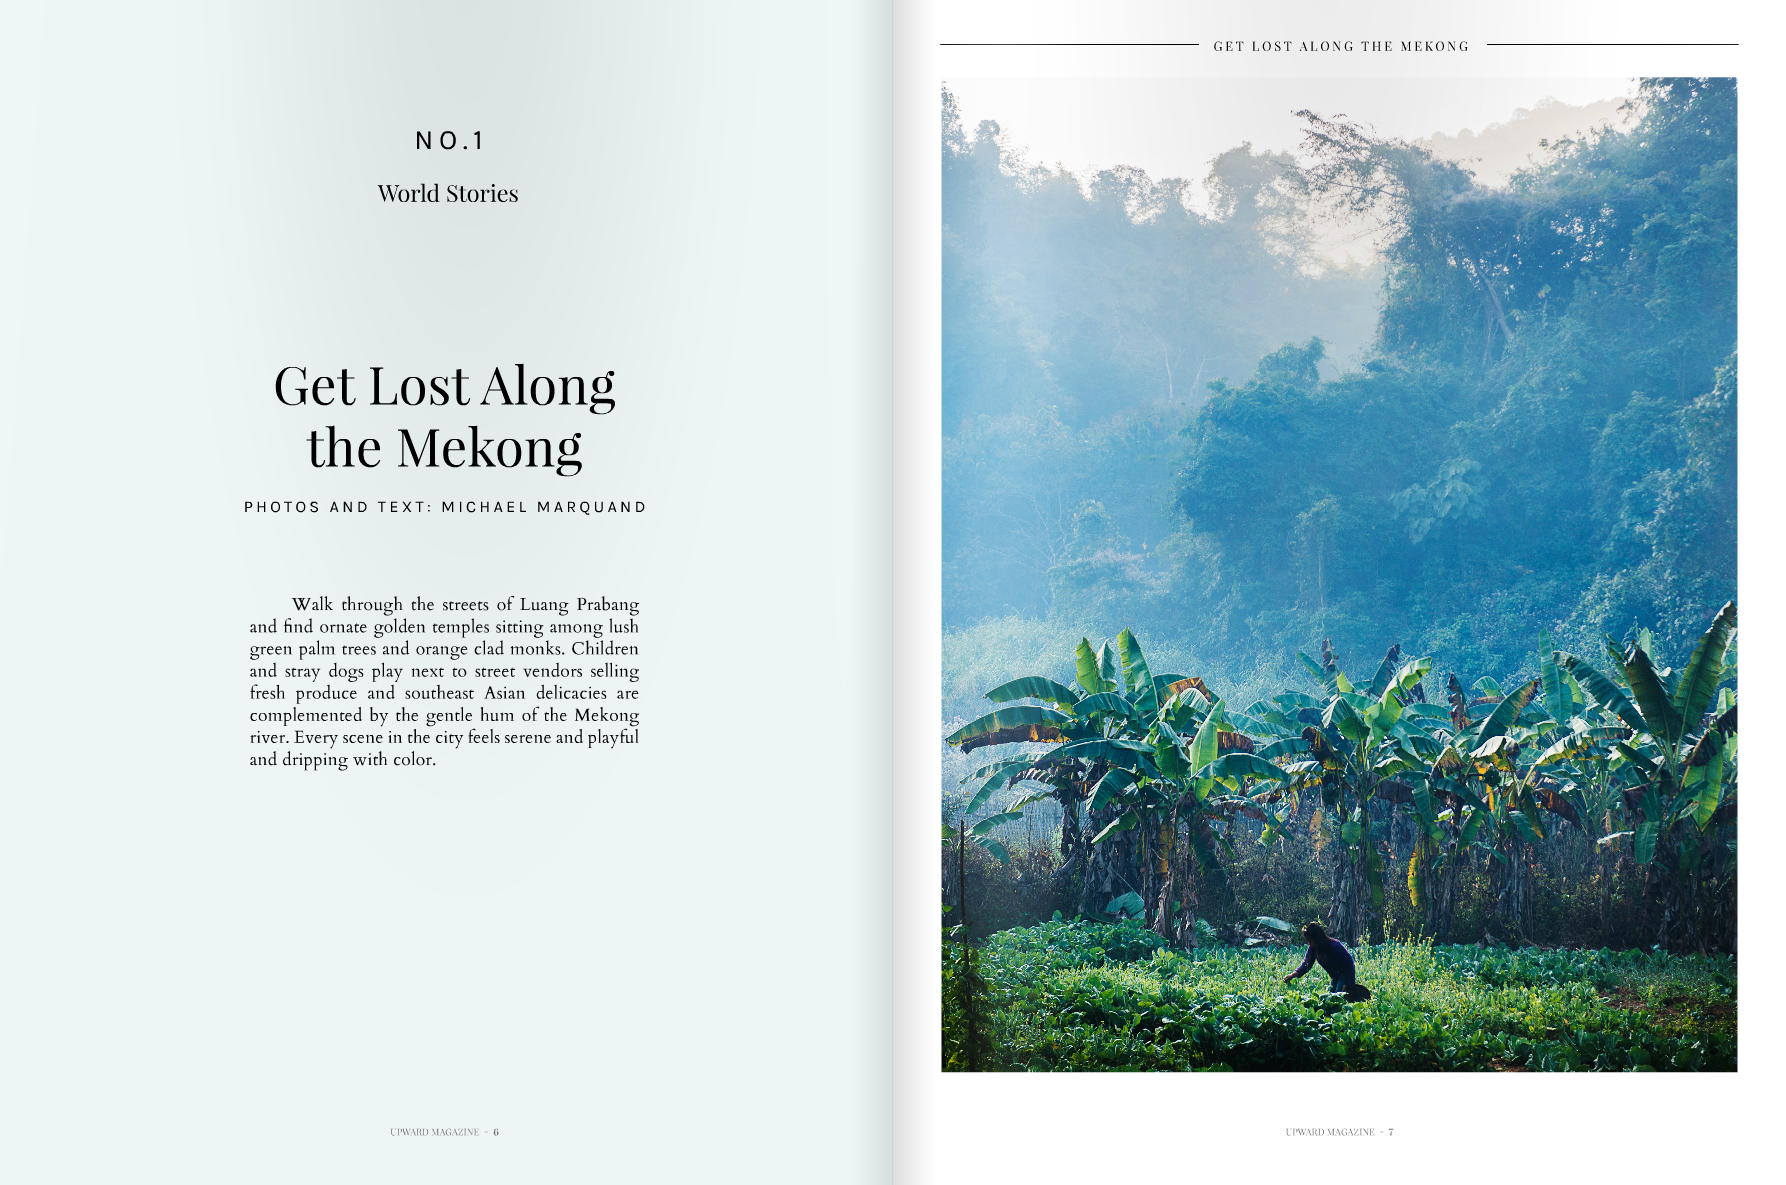 Get Lost Along the Mekong - Upward magazine